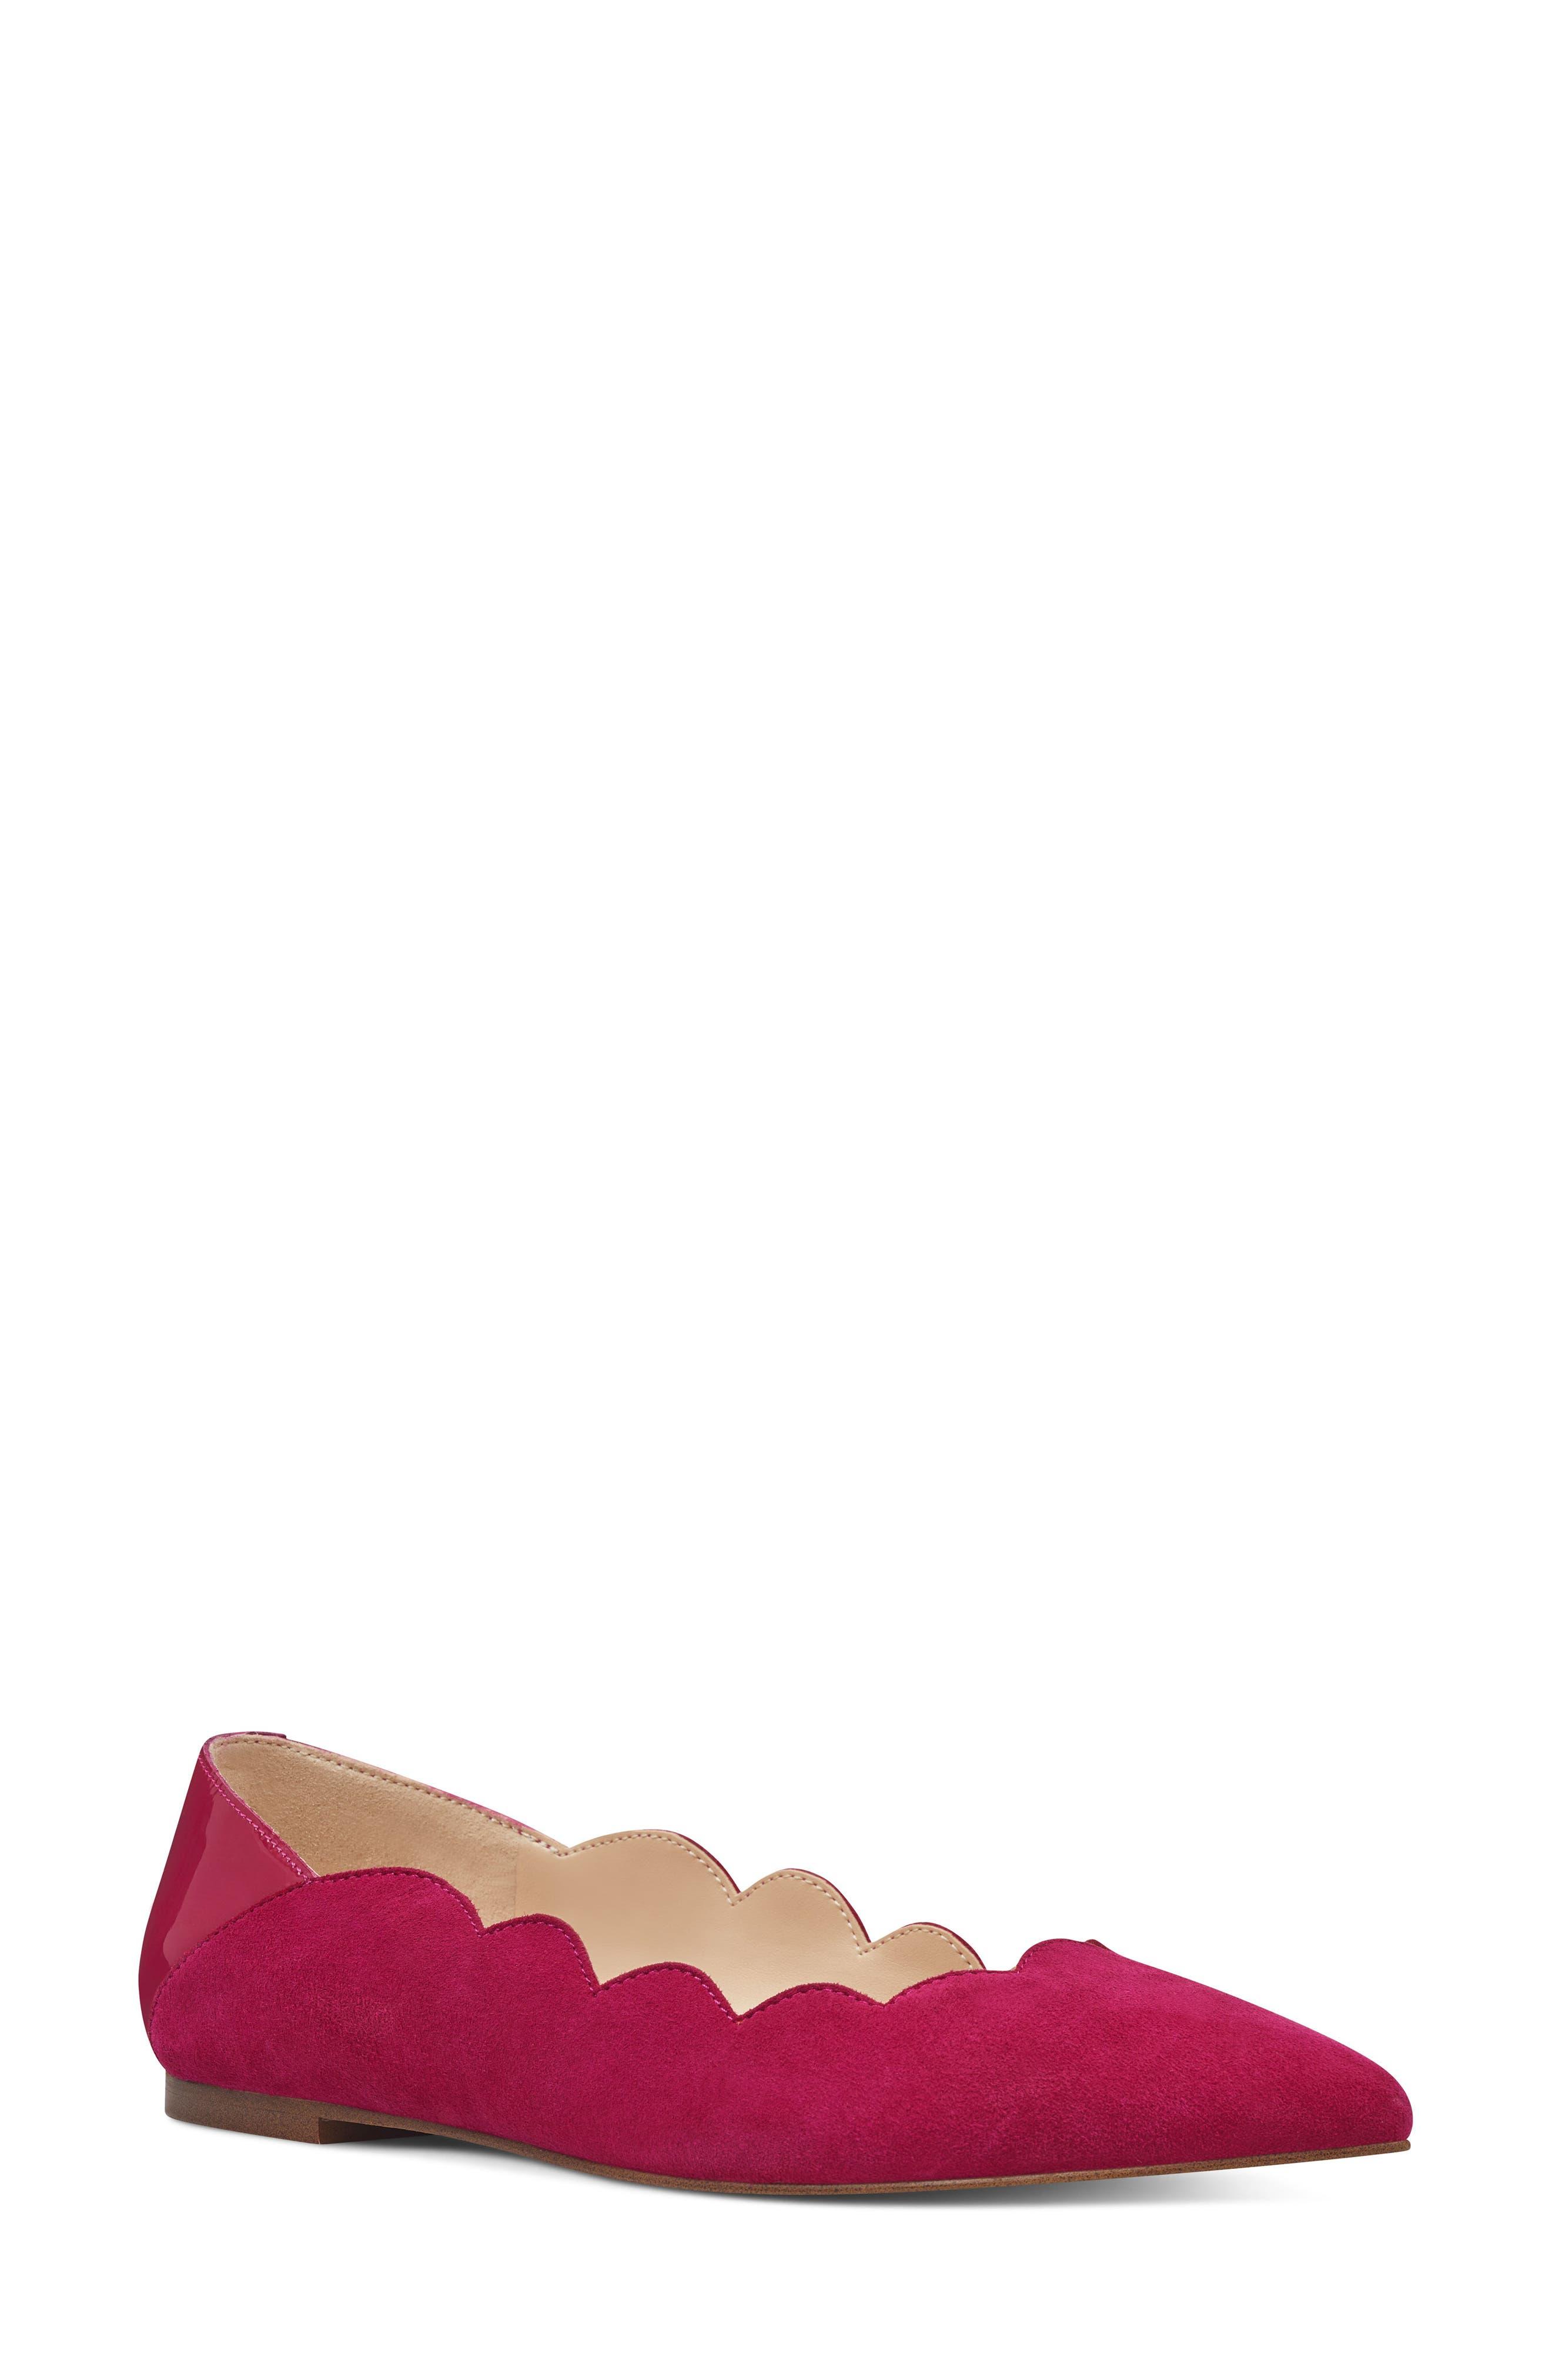 Nine West Ansley Scalloped Pointy Toe Flat, Pink